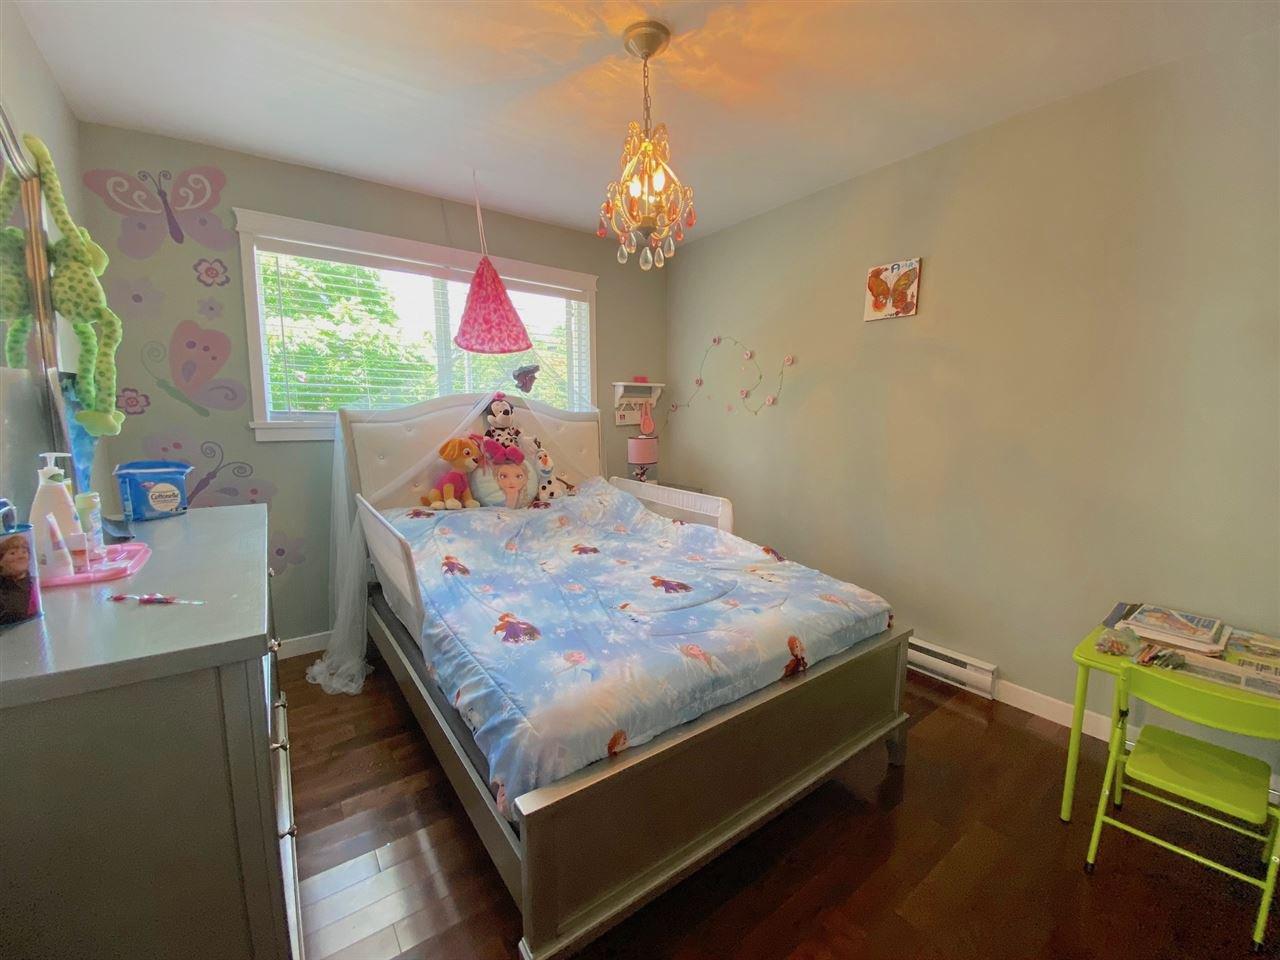 Photo 7: Photos: 555 55A STREET in Delta: Pebble Hill House for sale (Tsawwassen)  : MLS®# R2481635